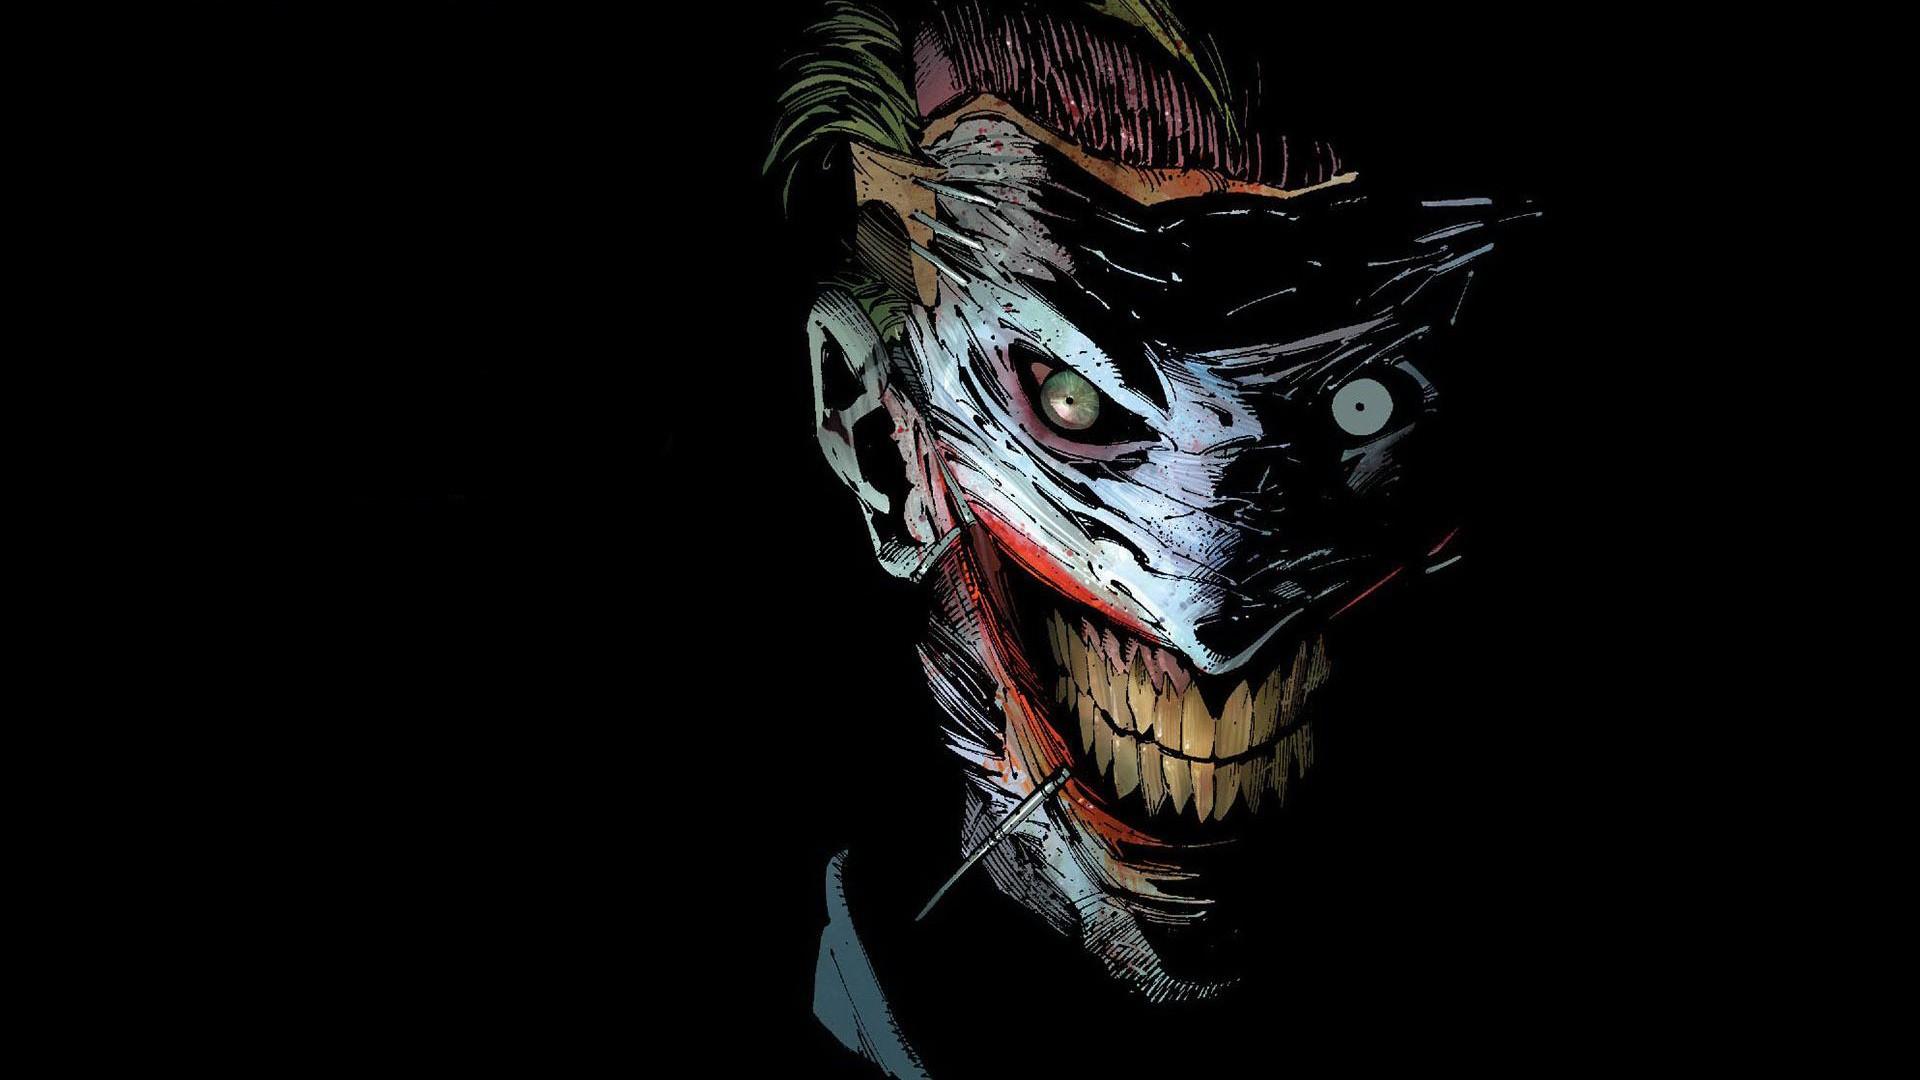 General 1920x1080 Joker scars DC Comics mask comic books black background artwork comics comic art Batman simple background teeth